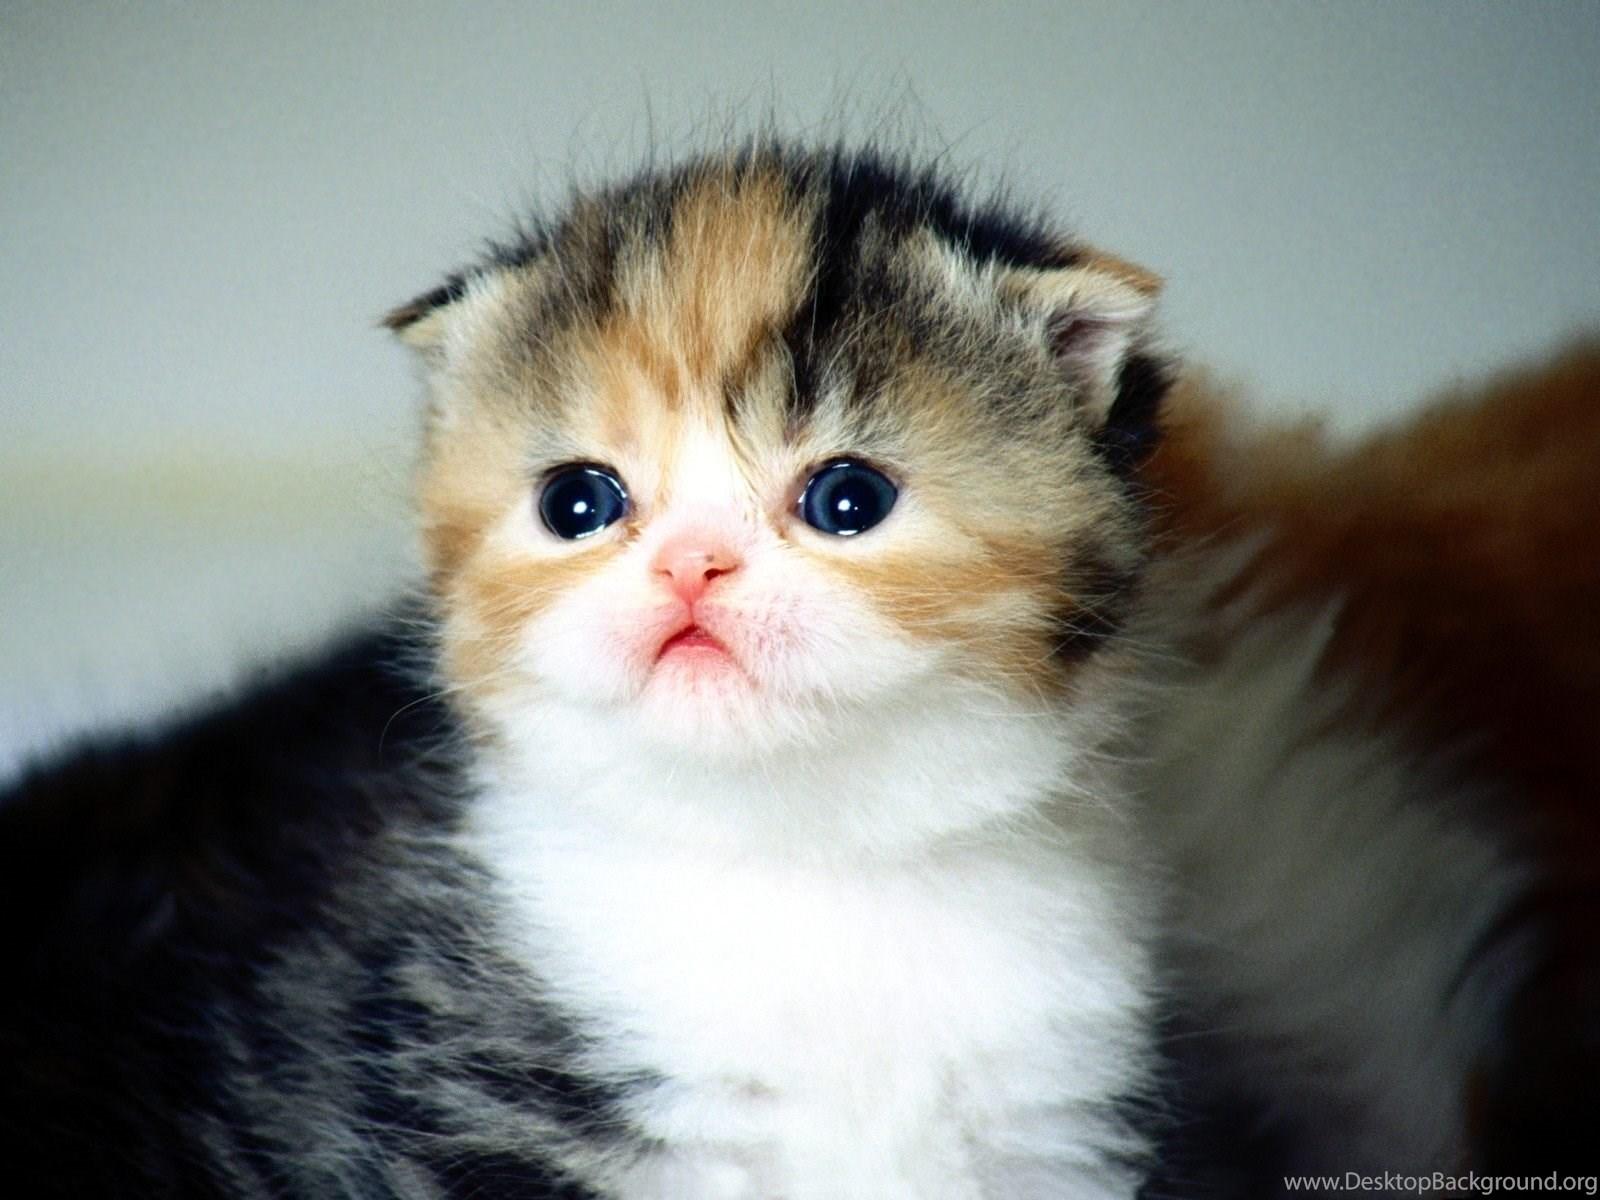 732101 cute cat wallpapers desktop free